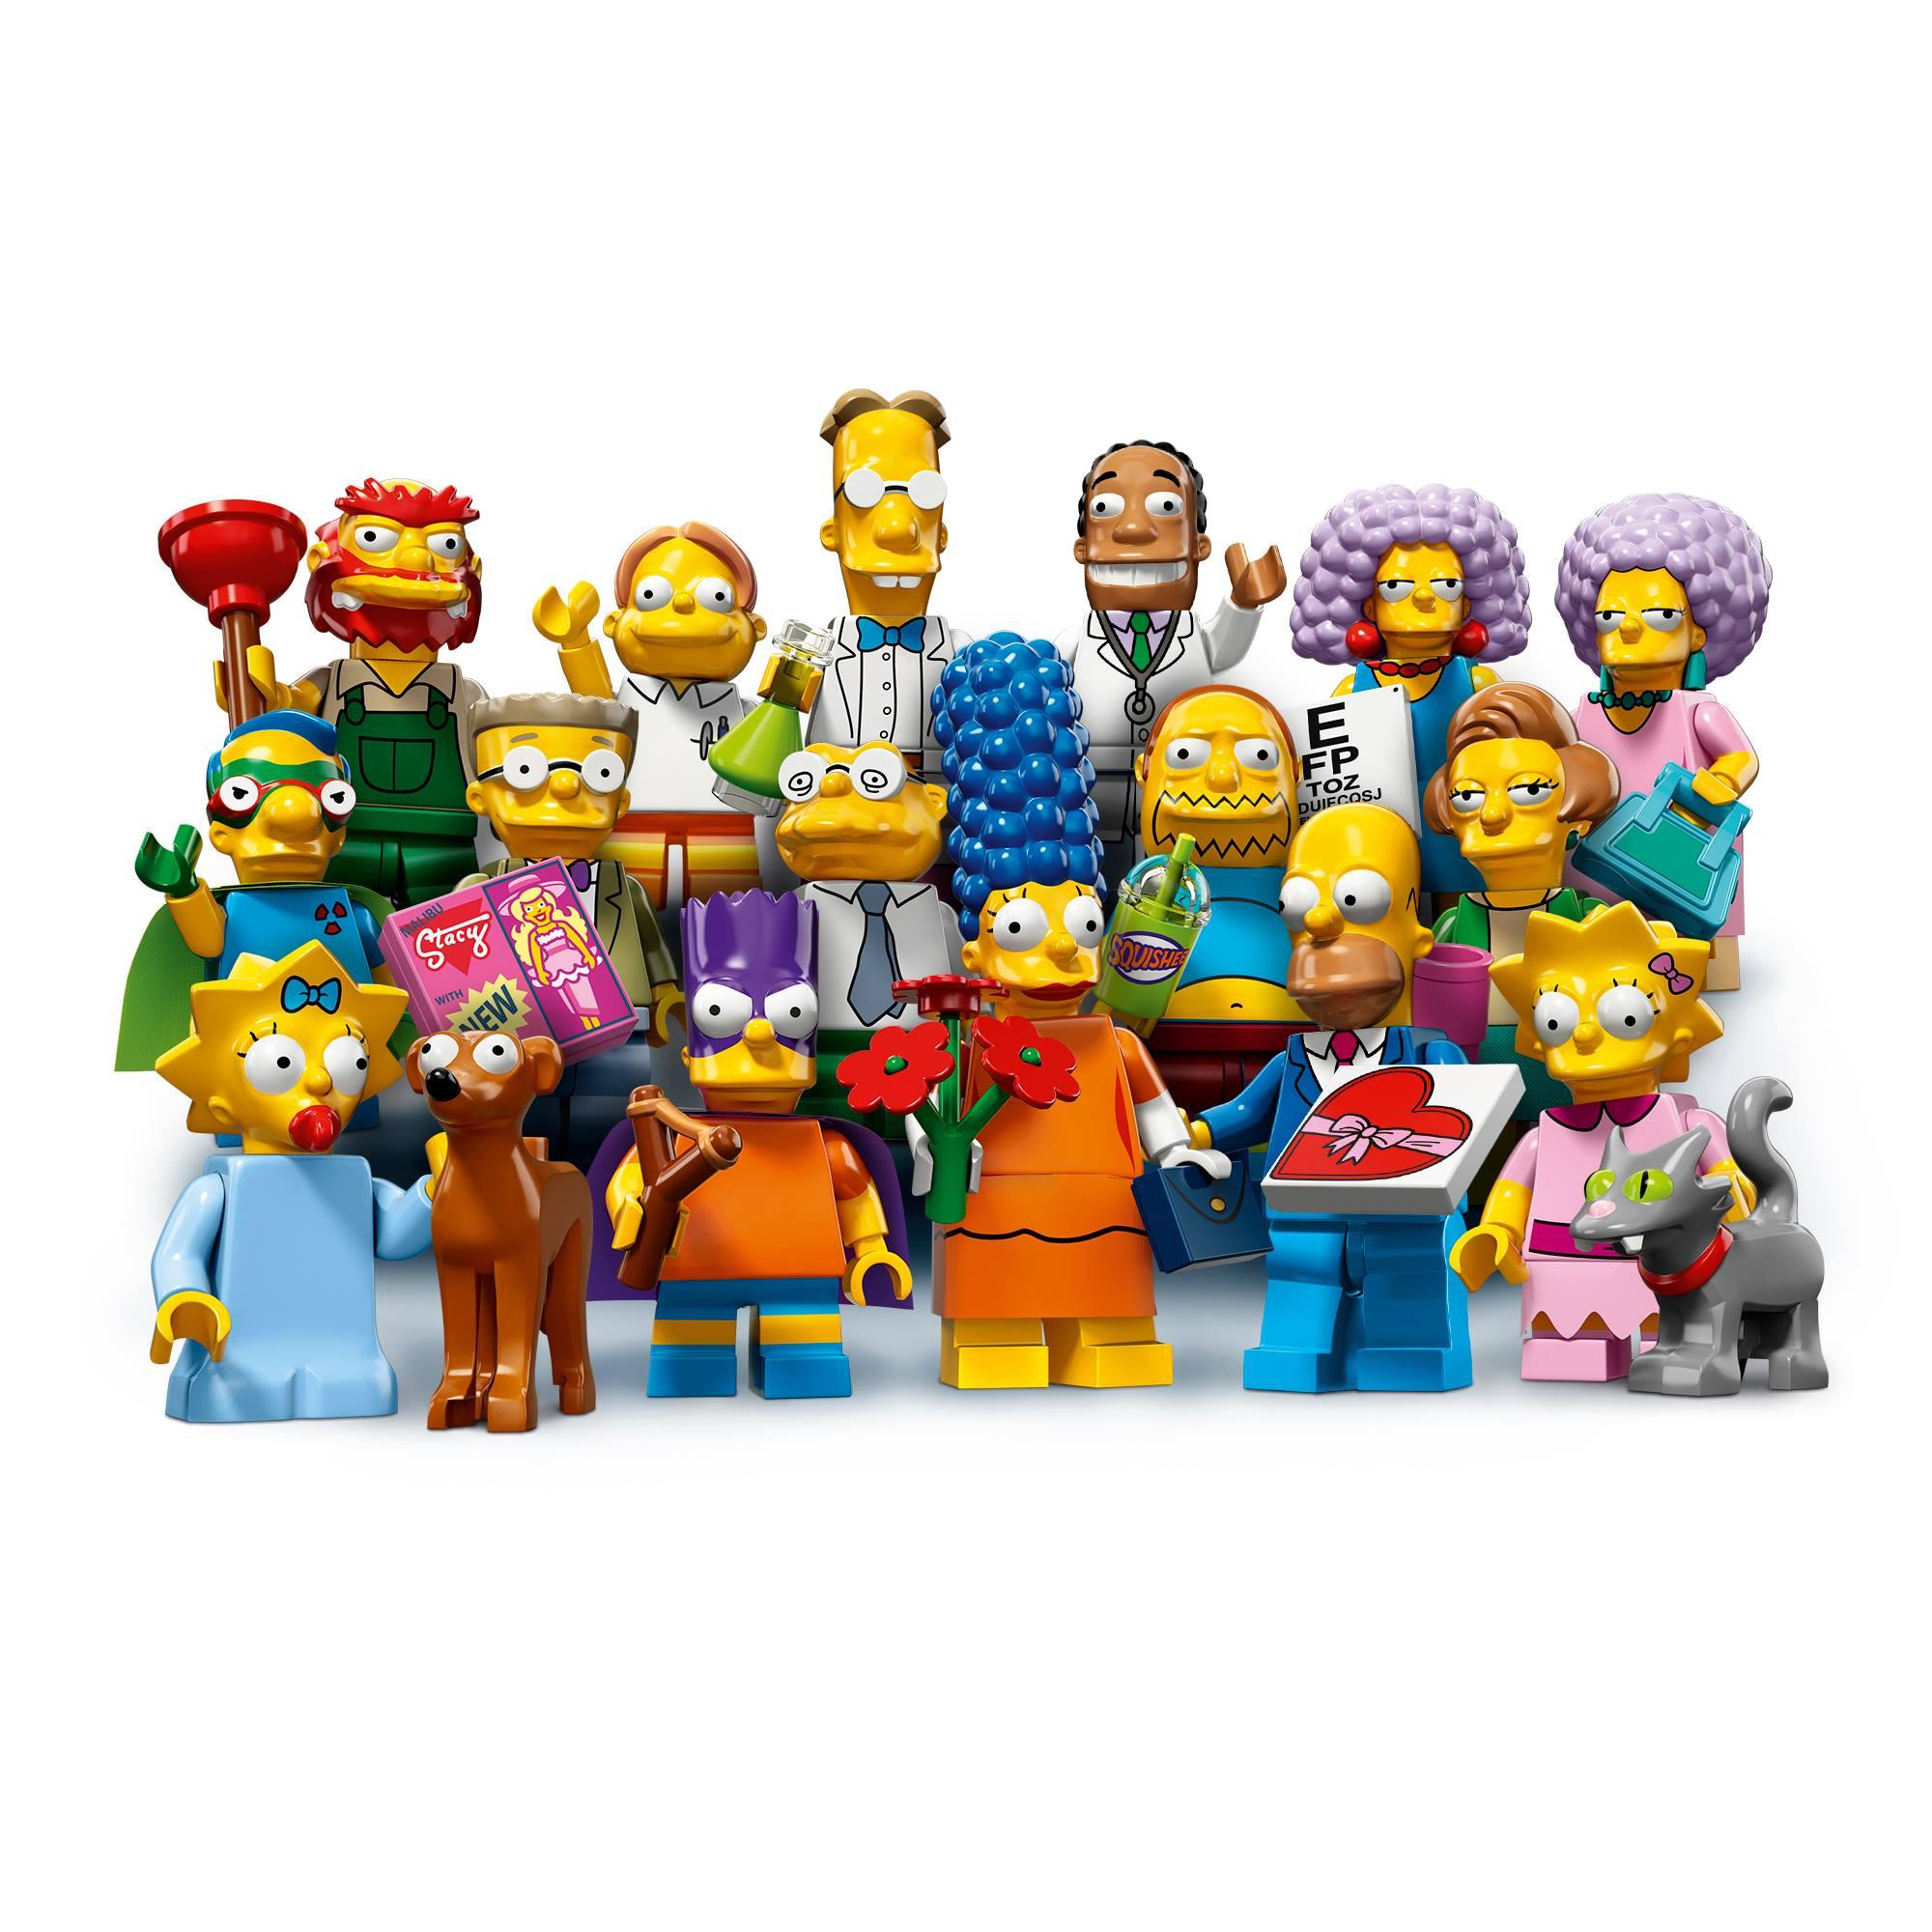 71009 LEGO® Minifigures The Simpsons Series 2 #16 - Dr Hibbert